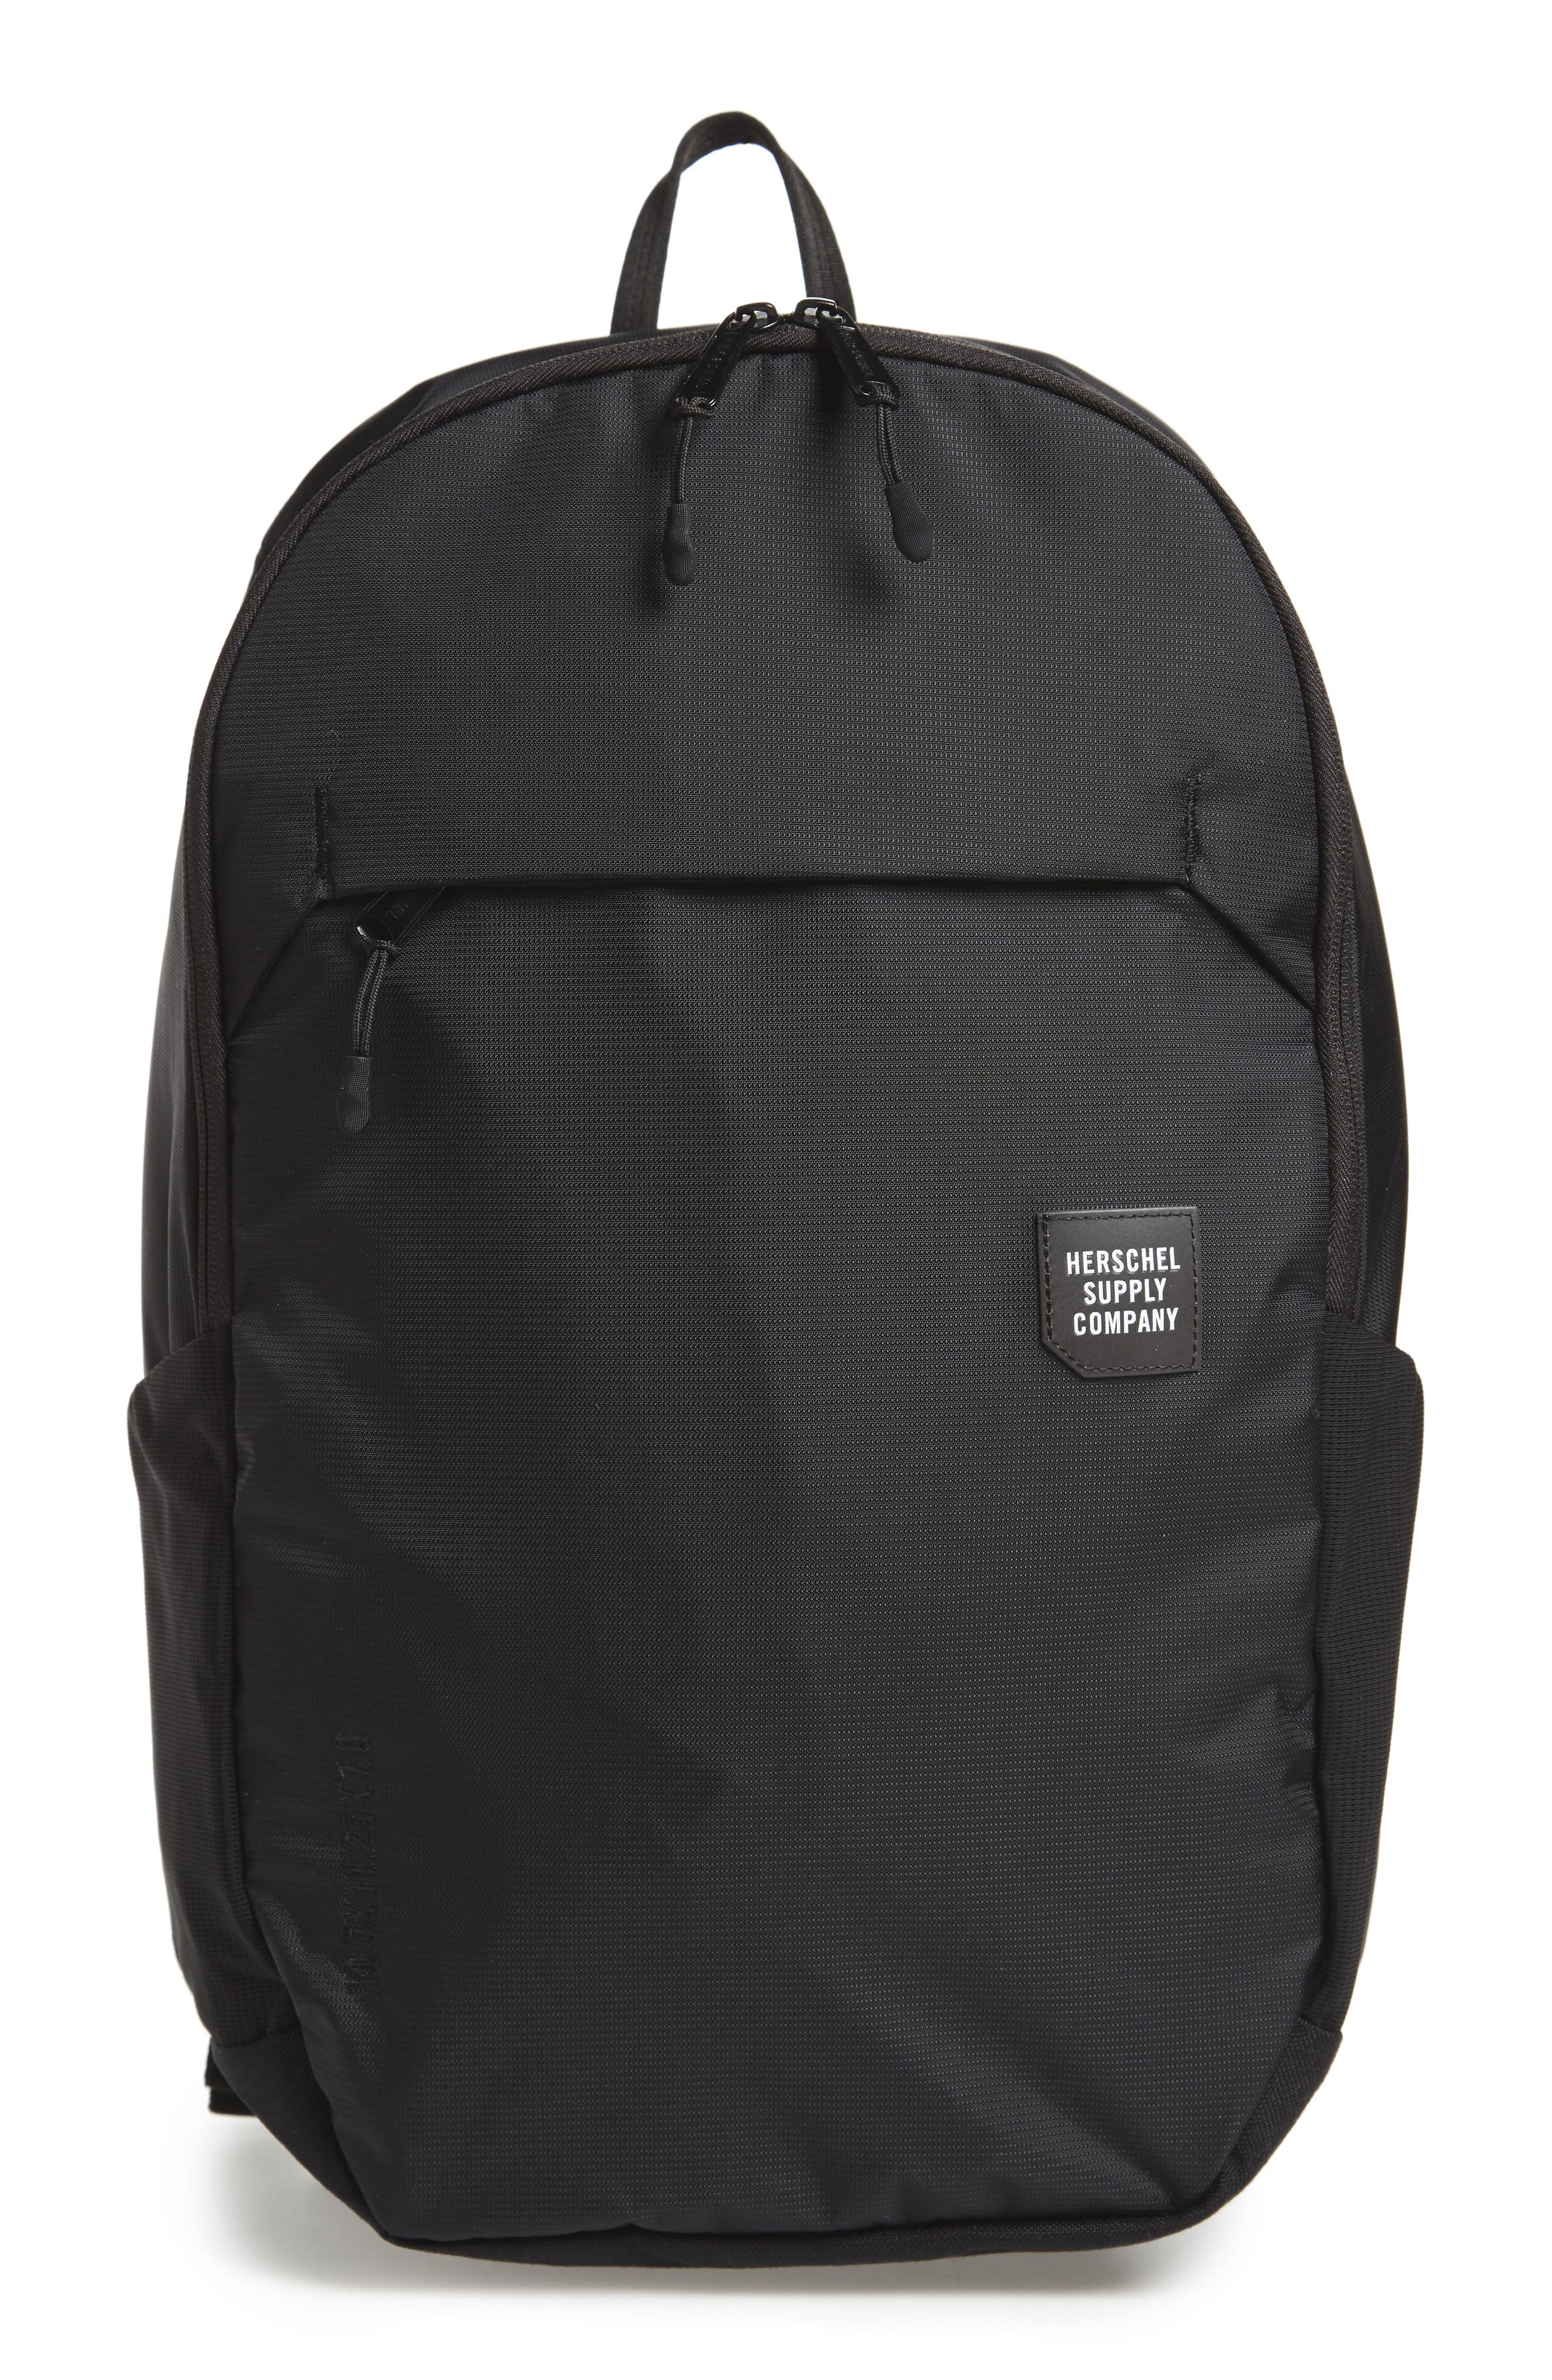 Mammoth Trail Backpack,                             Main thumbnail 1, color,                             Black